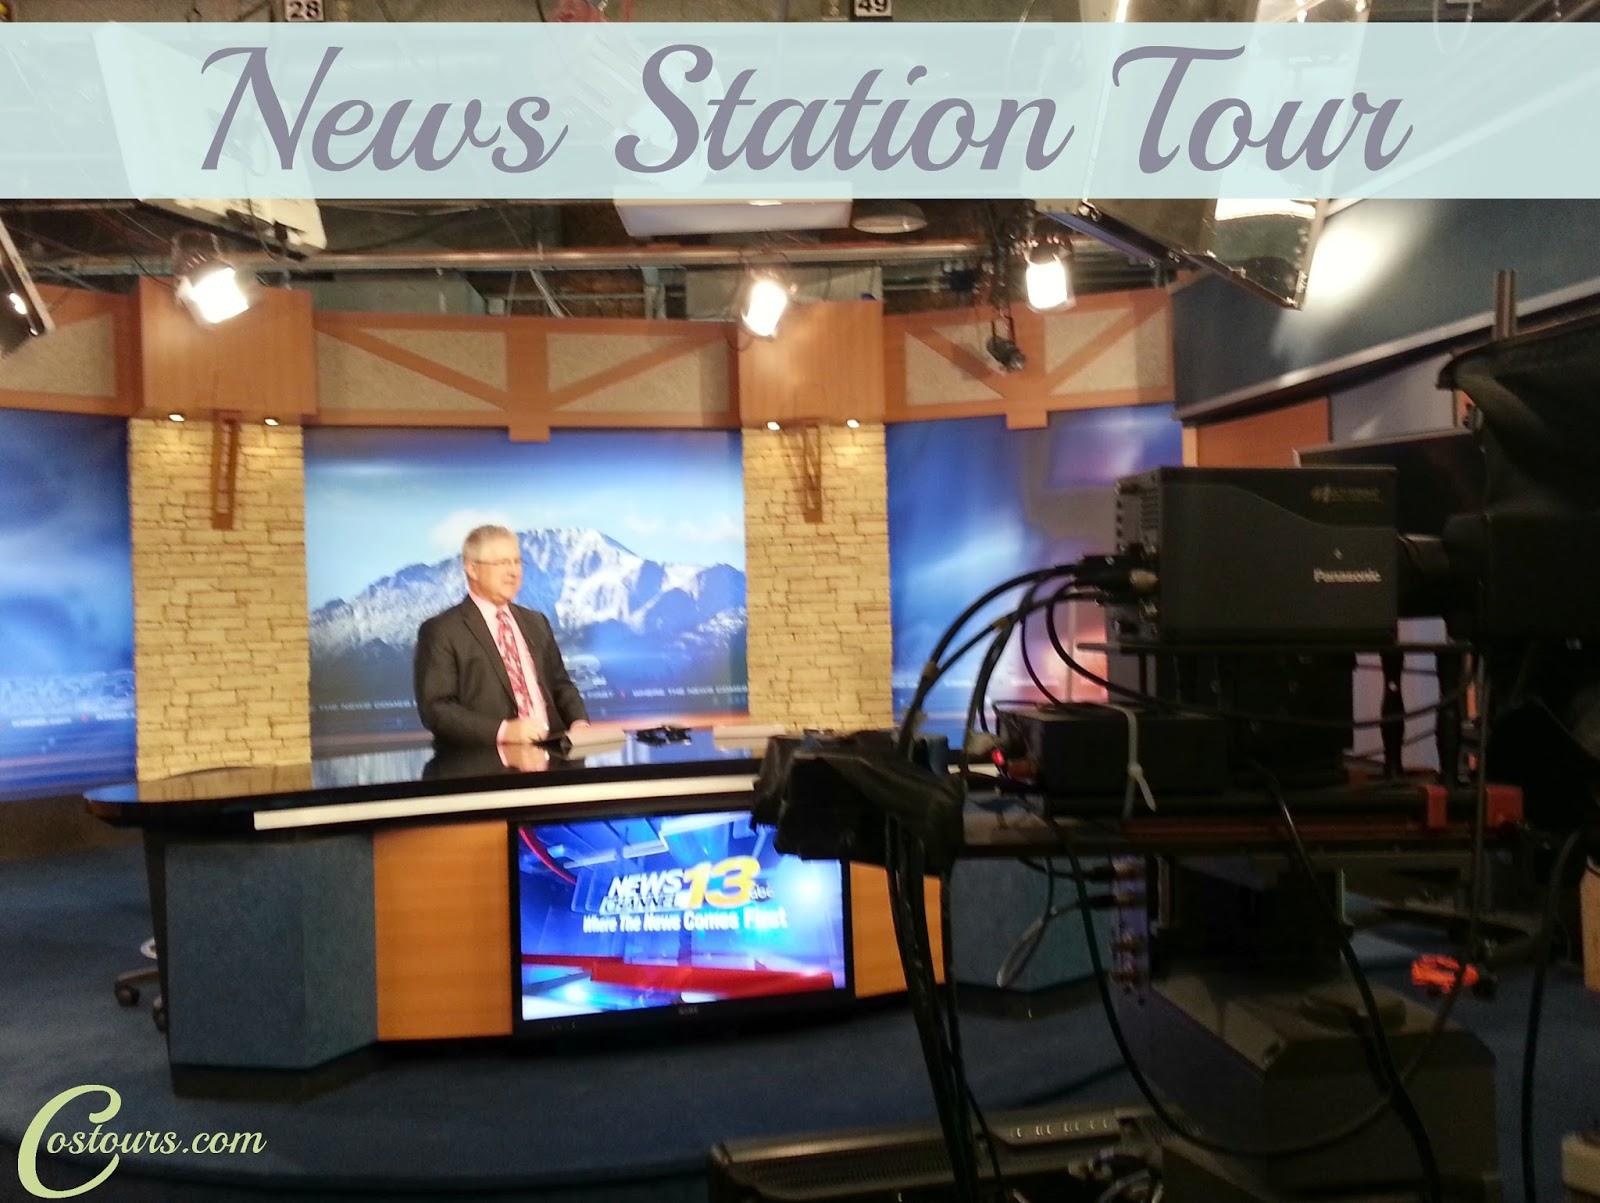 Tour a News Station